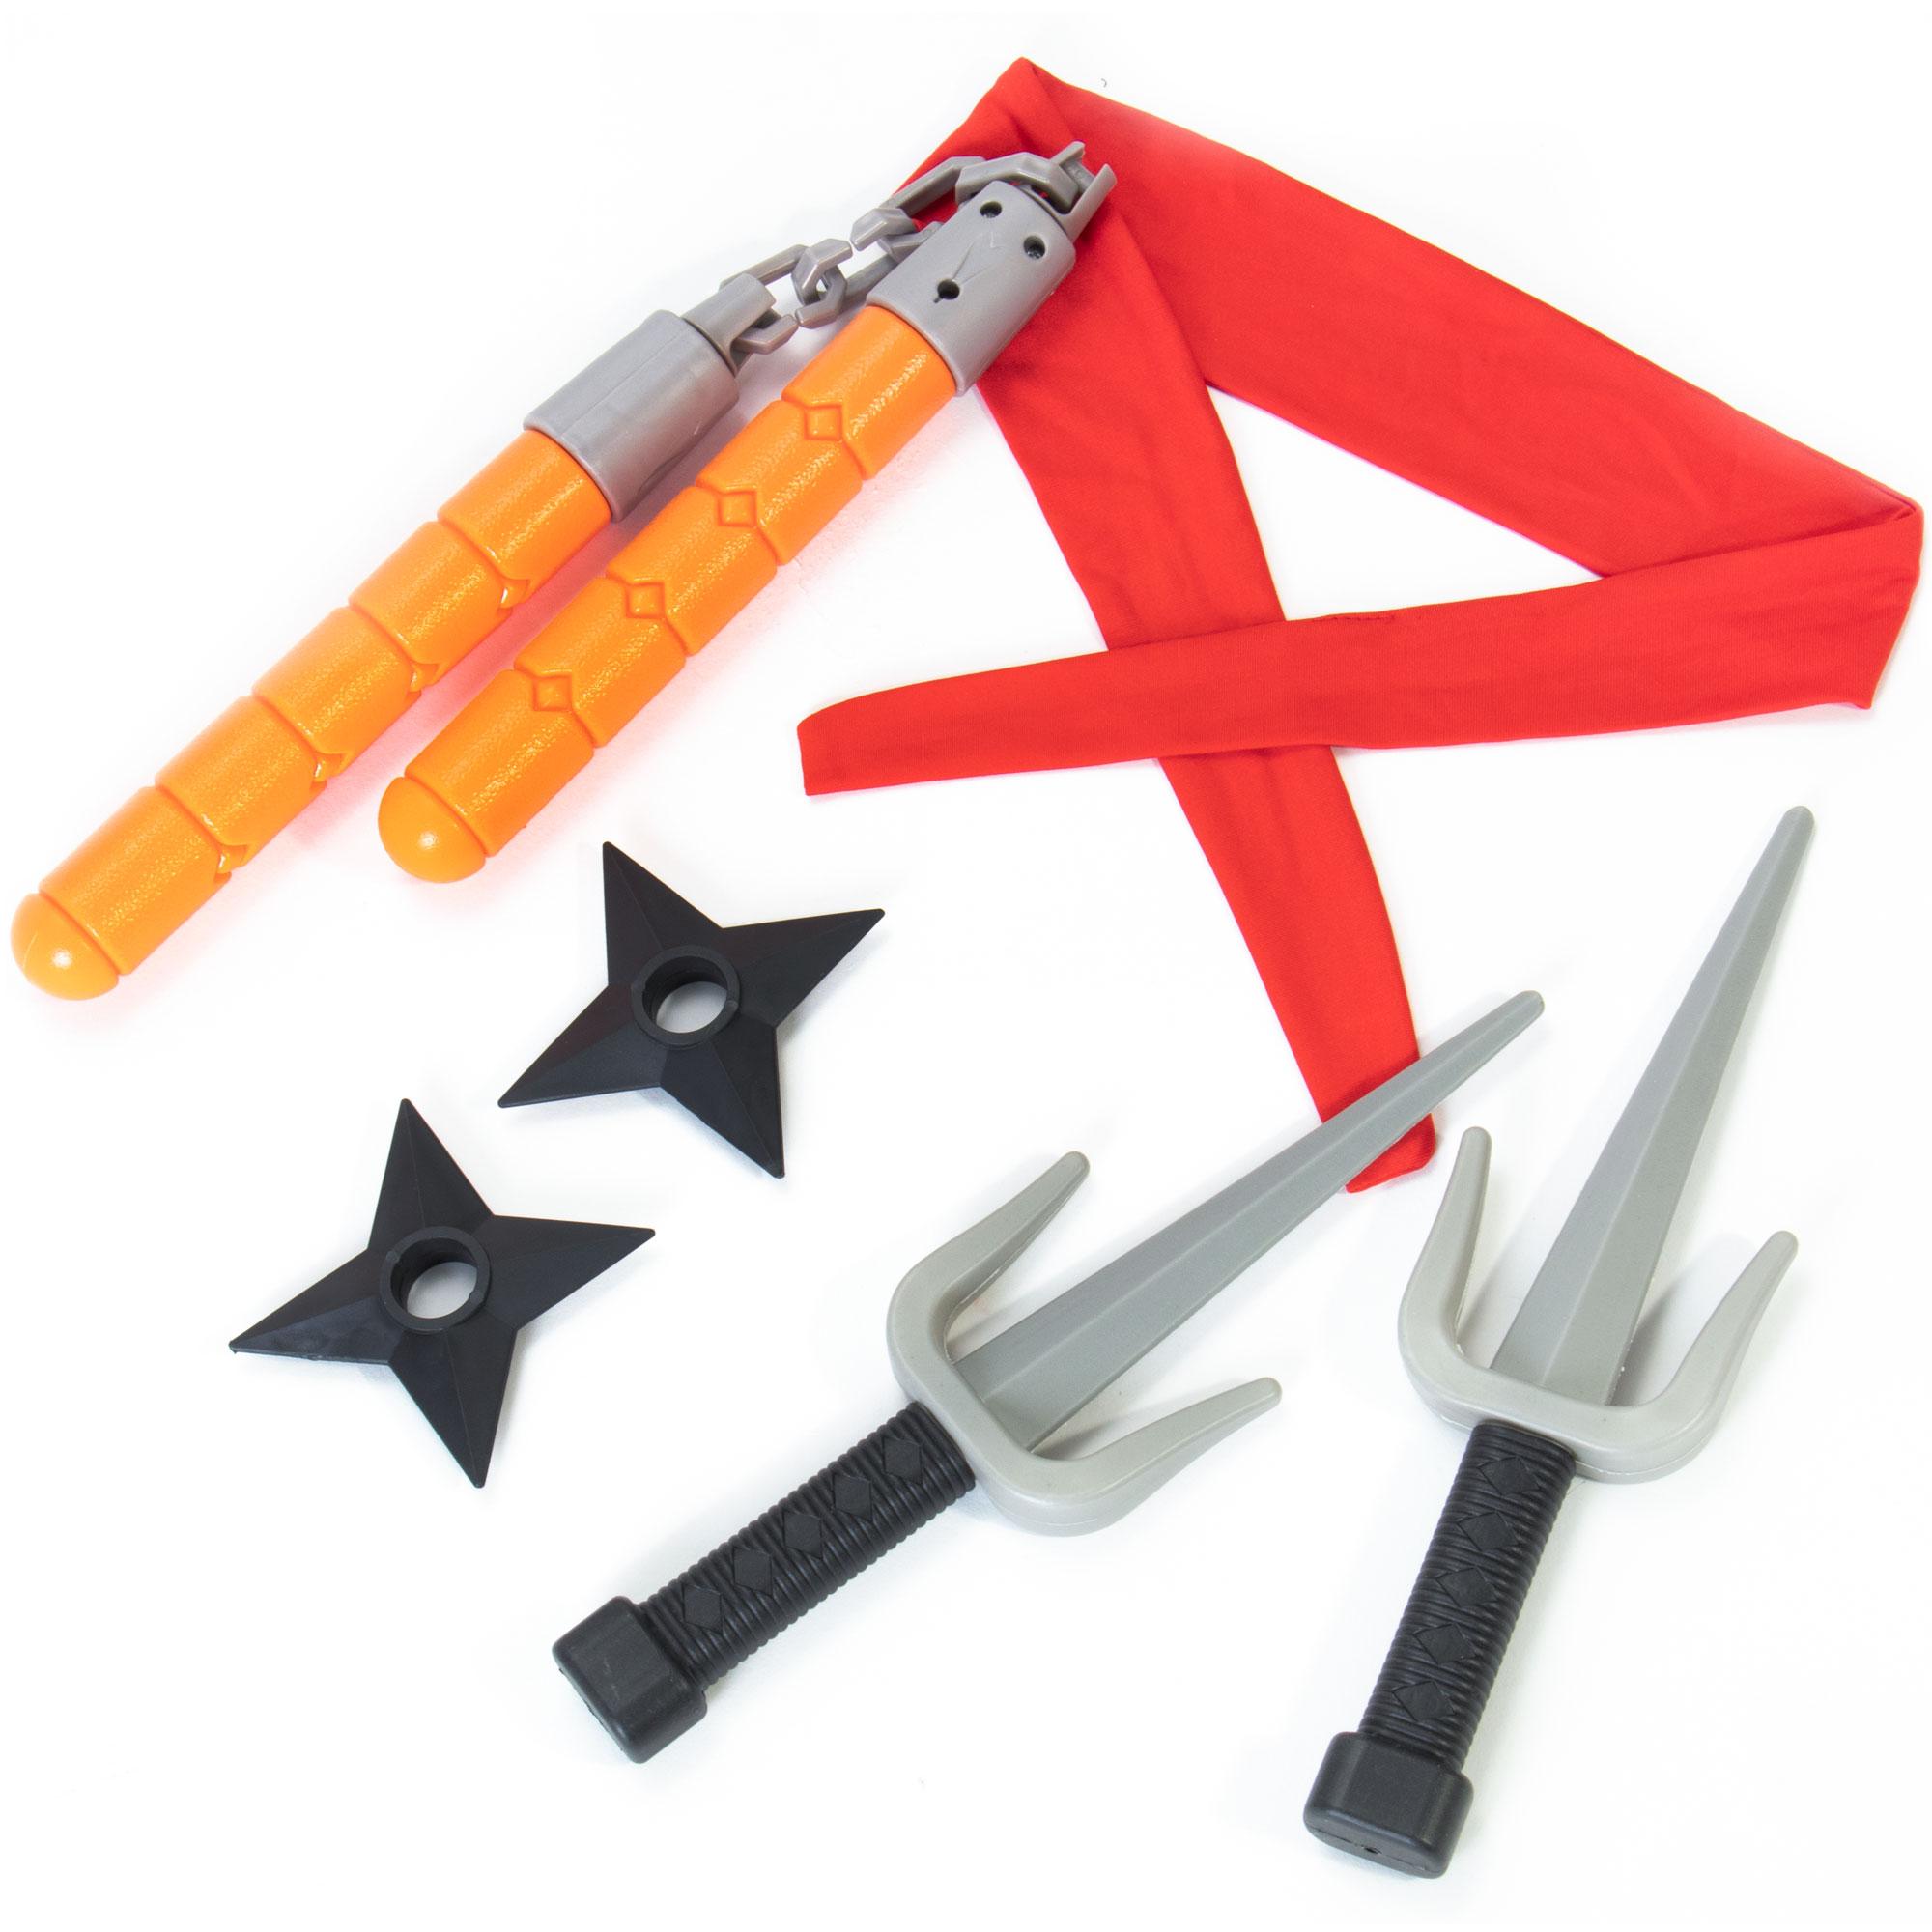 Ninja Master Accessory Kit